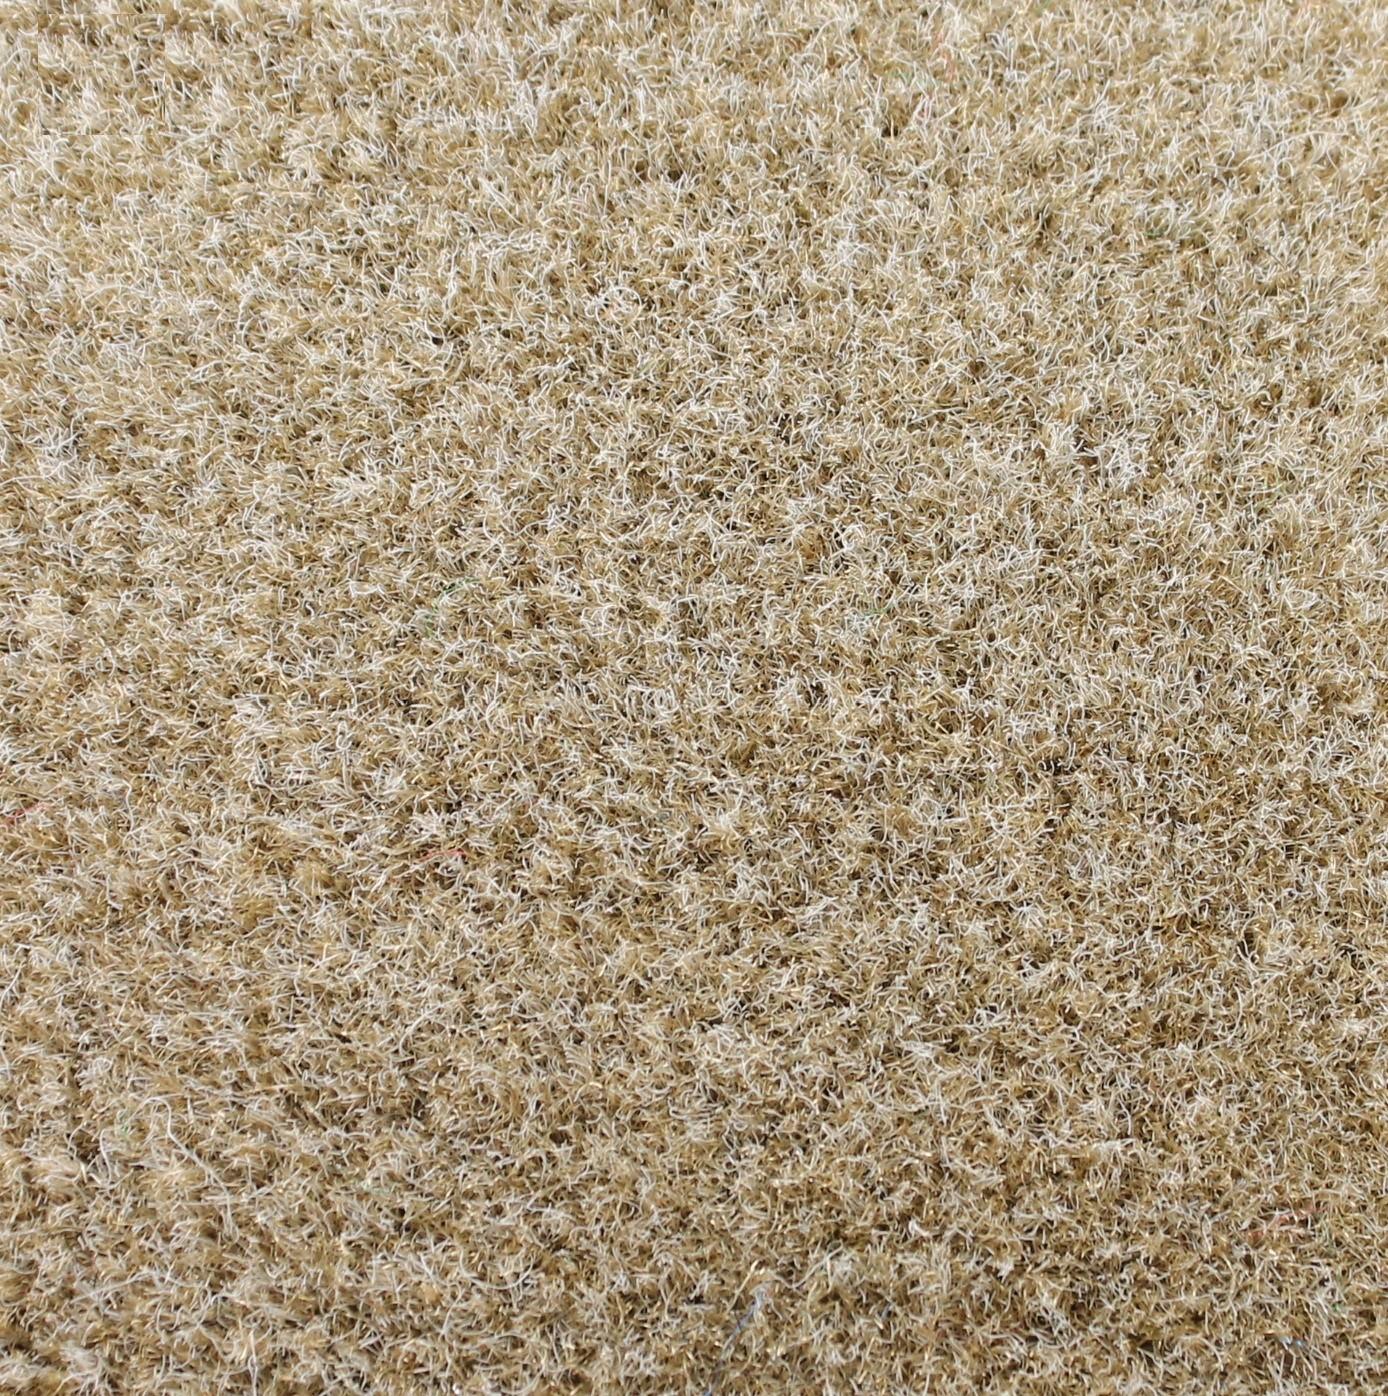 Economat Indoor Carpet Entrance Floor Mat Floor Mat Systems